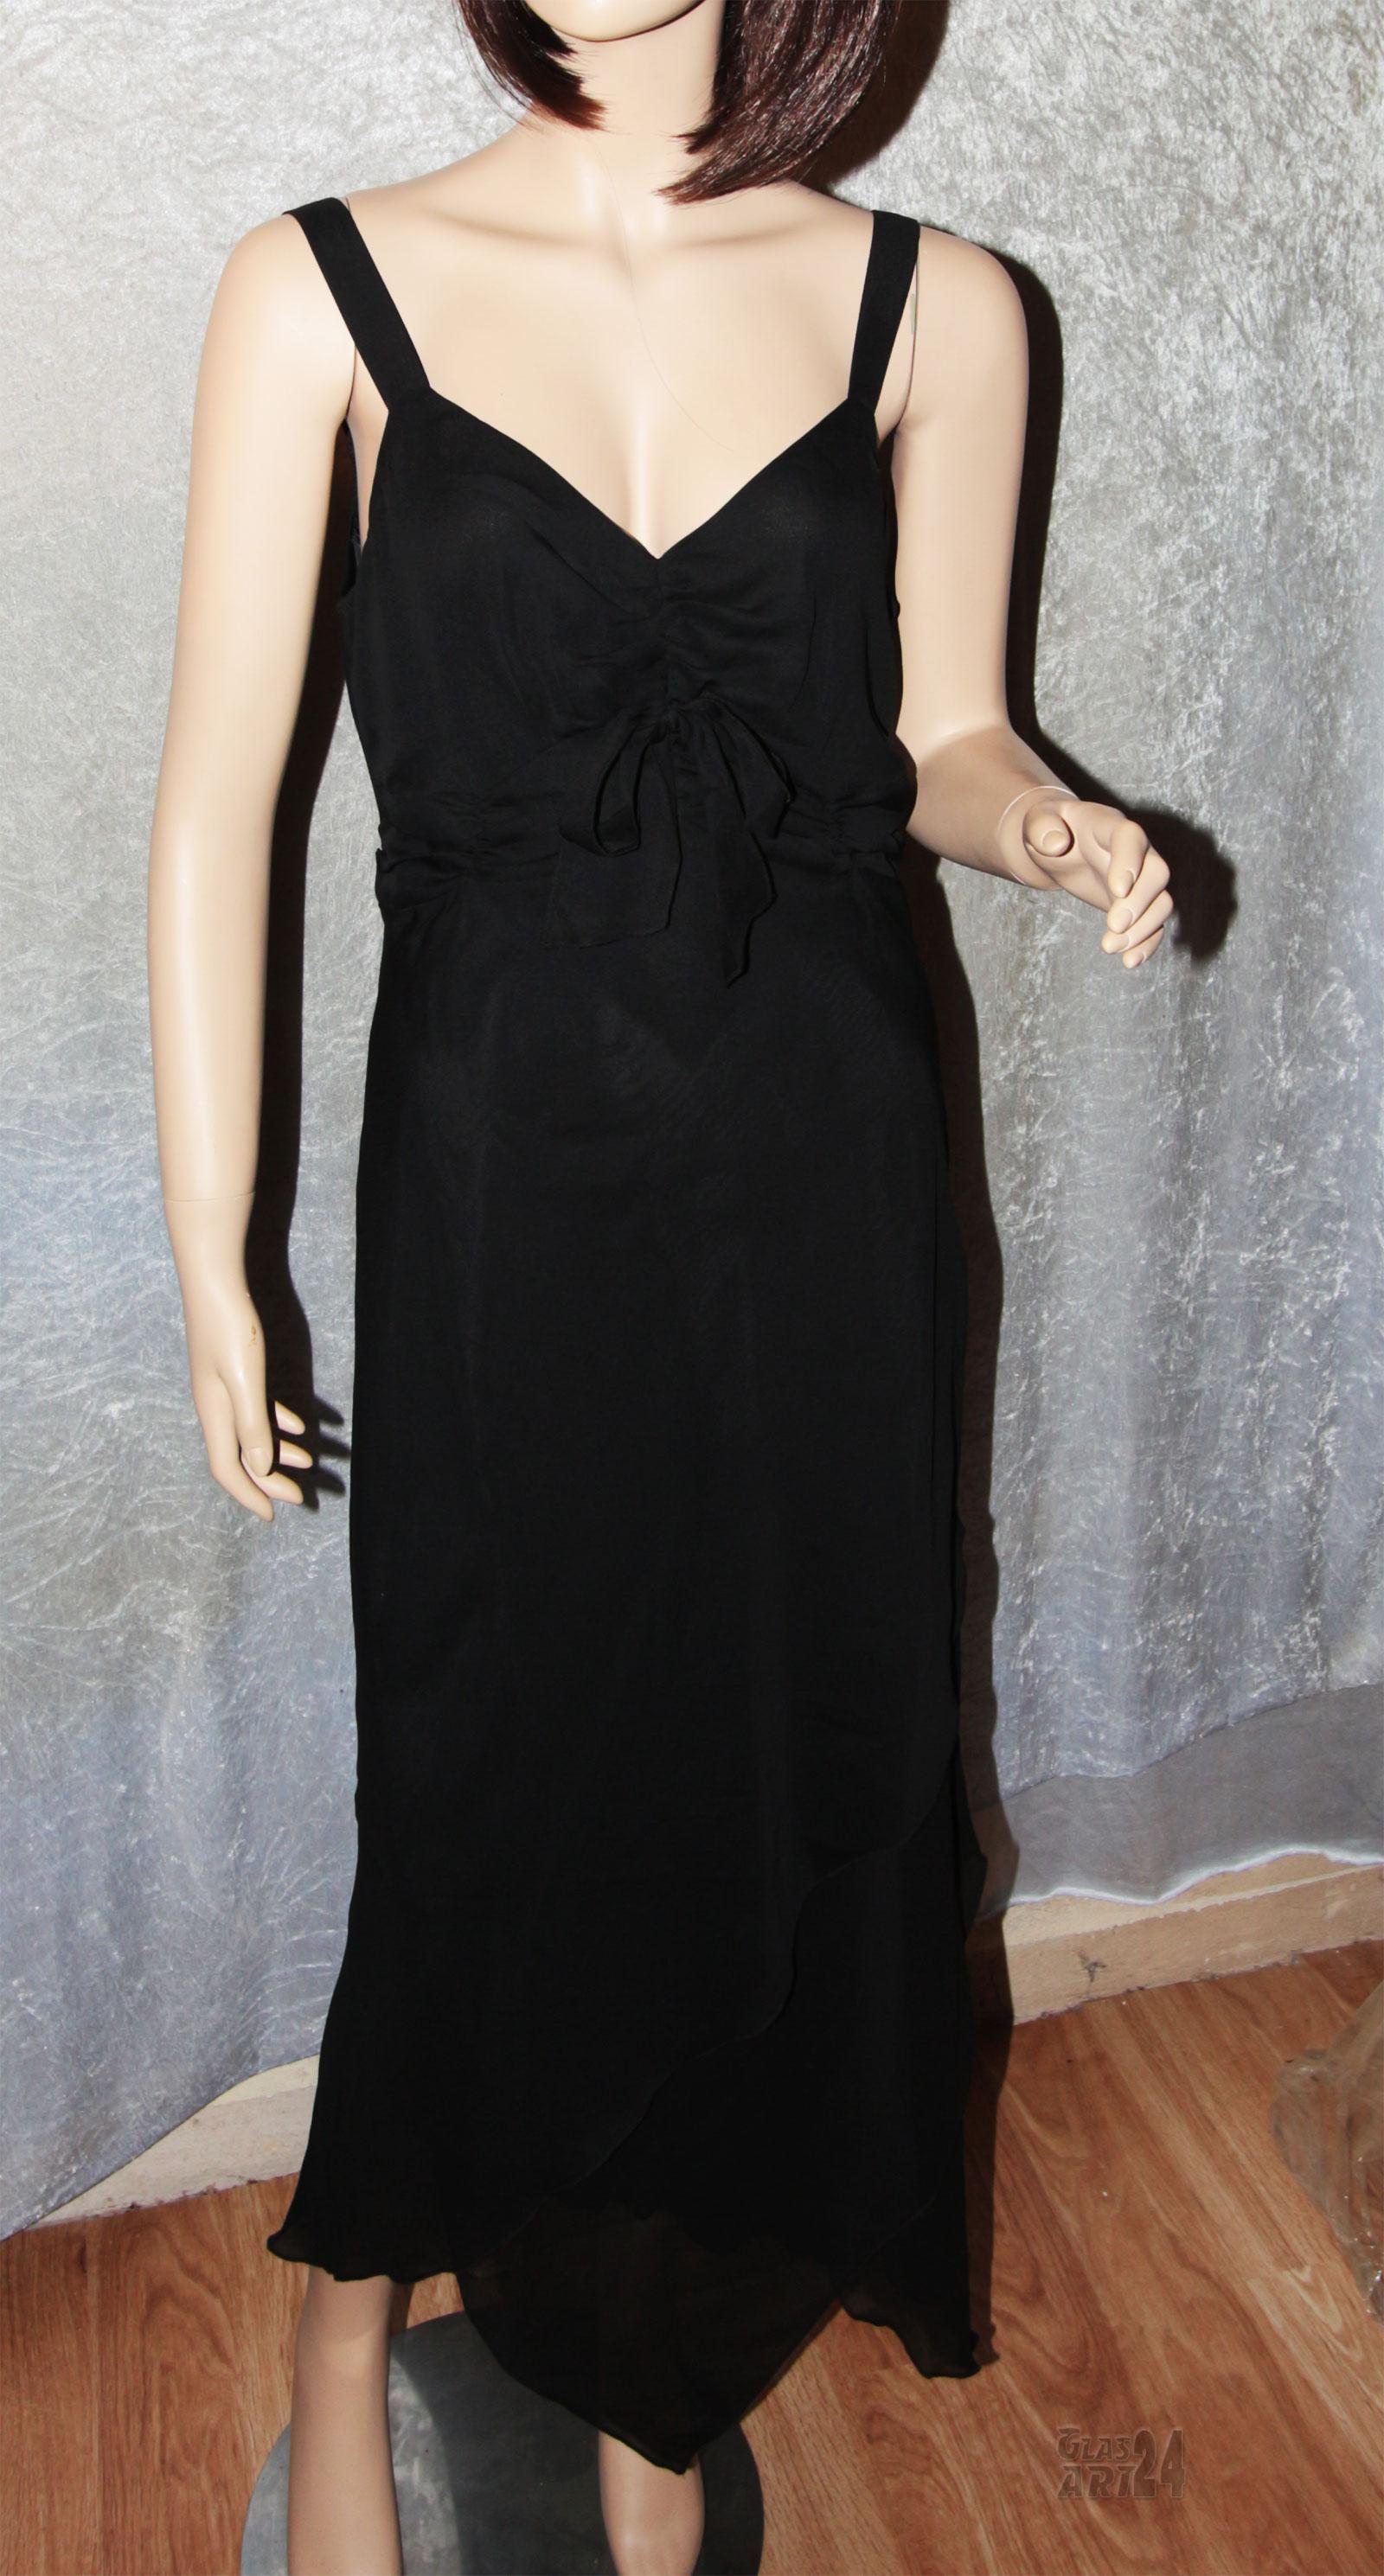 ashley brooke kleid abendkleid festkleid ballkleid schwarz. Black Bedroom Furniture Sets. Home Design Ideas